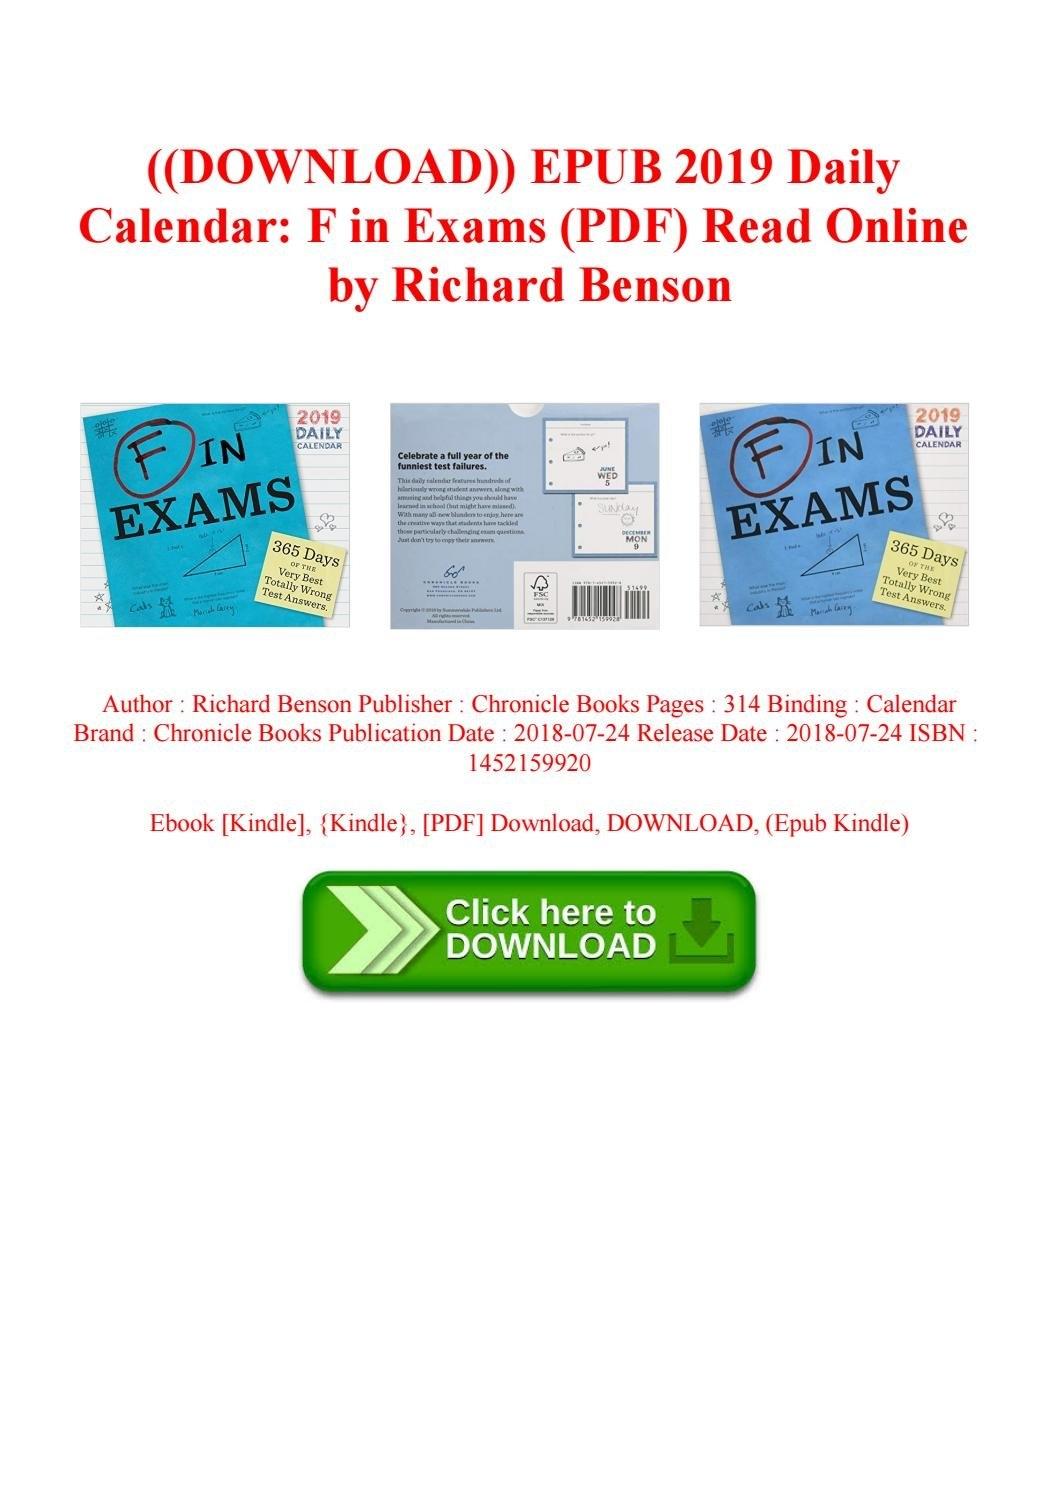 Download)) Epub 2019 Daily Calendar F In Exams (Pdf) Read Online F In Exams 2019 Calendar